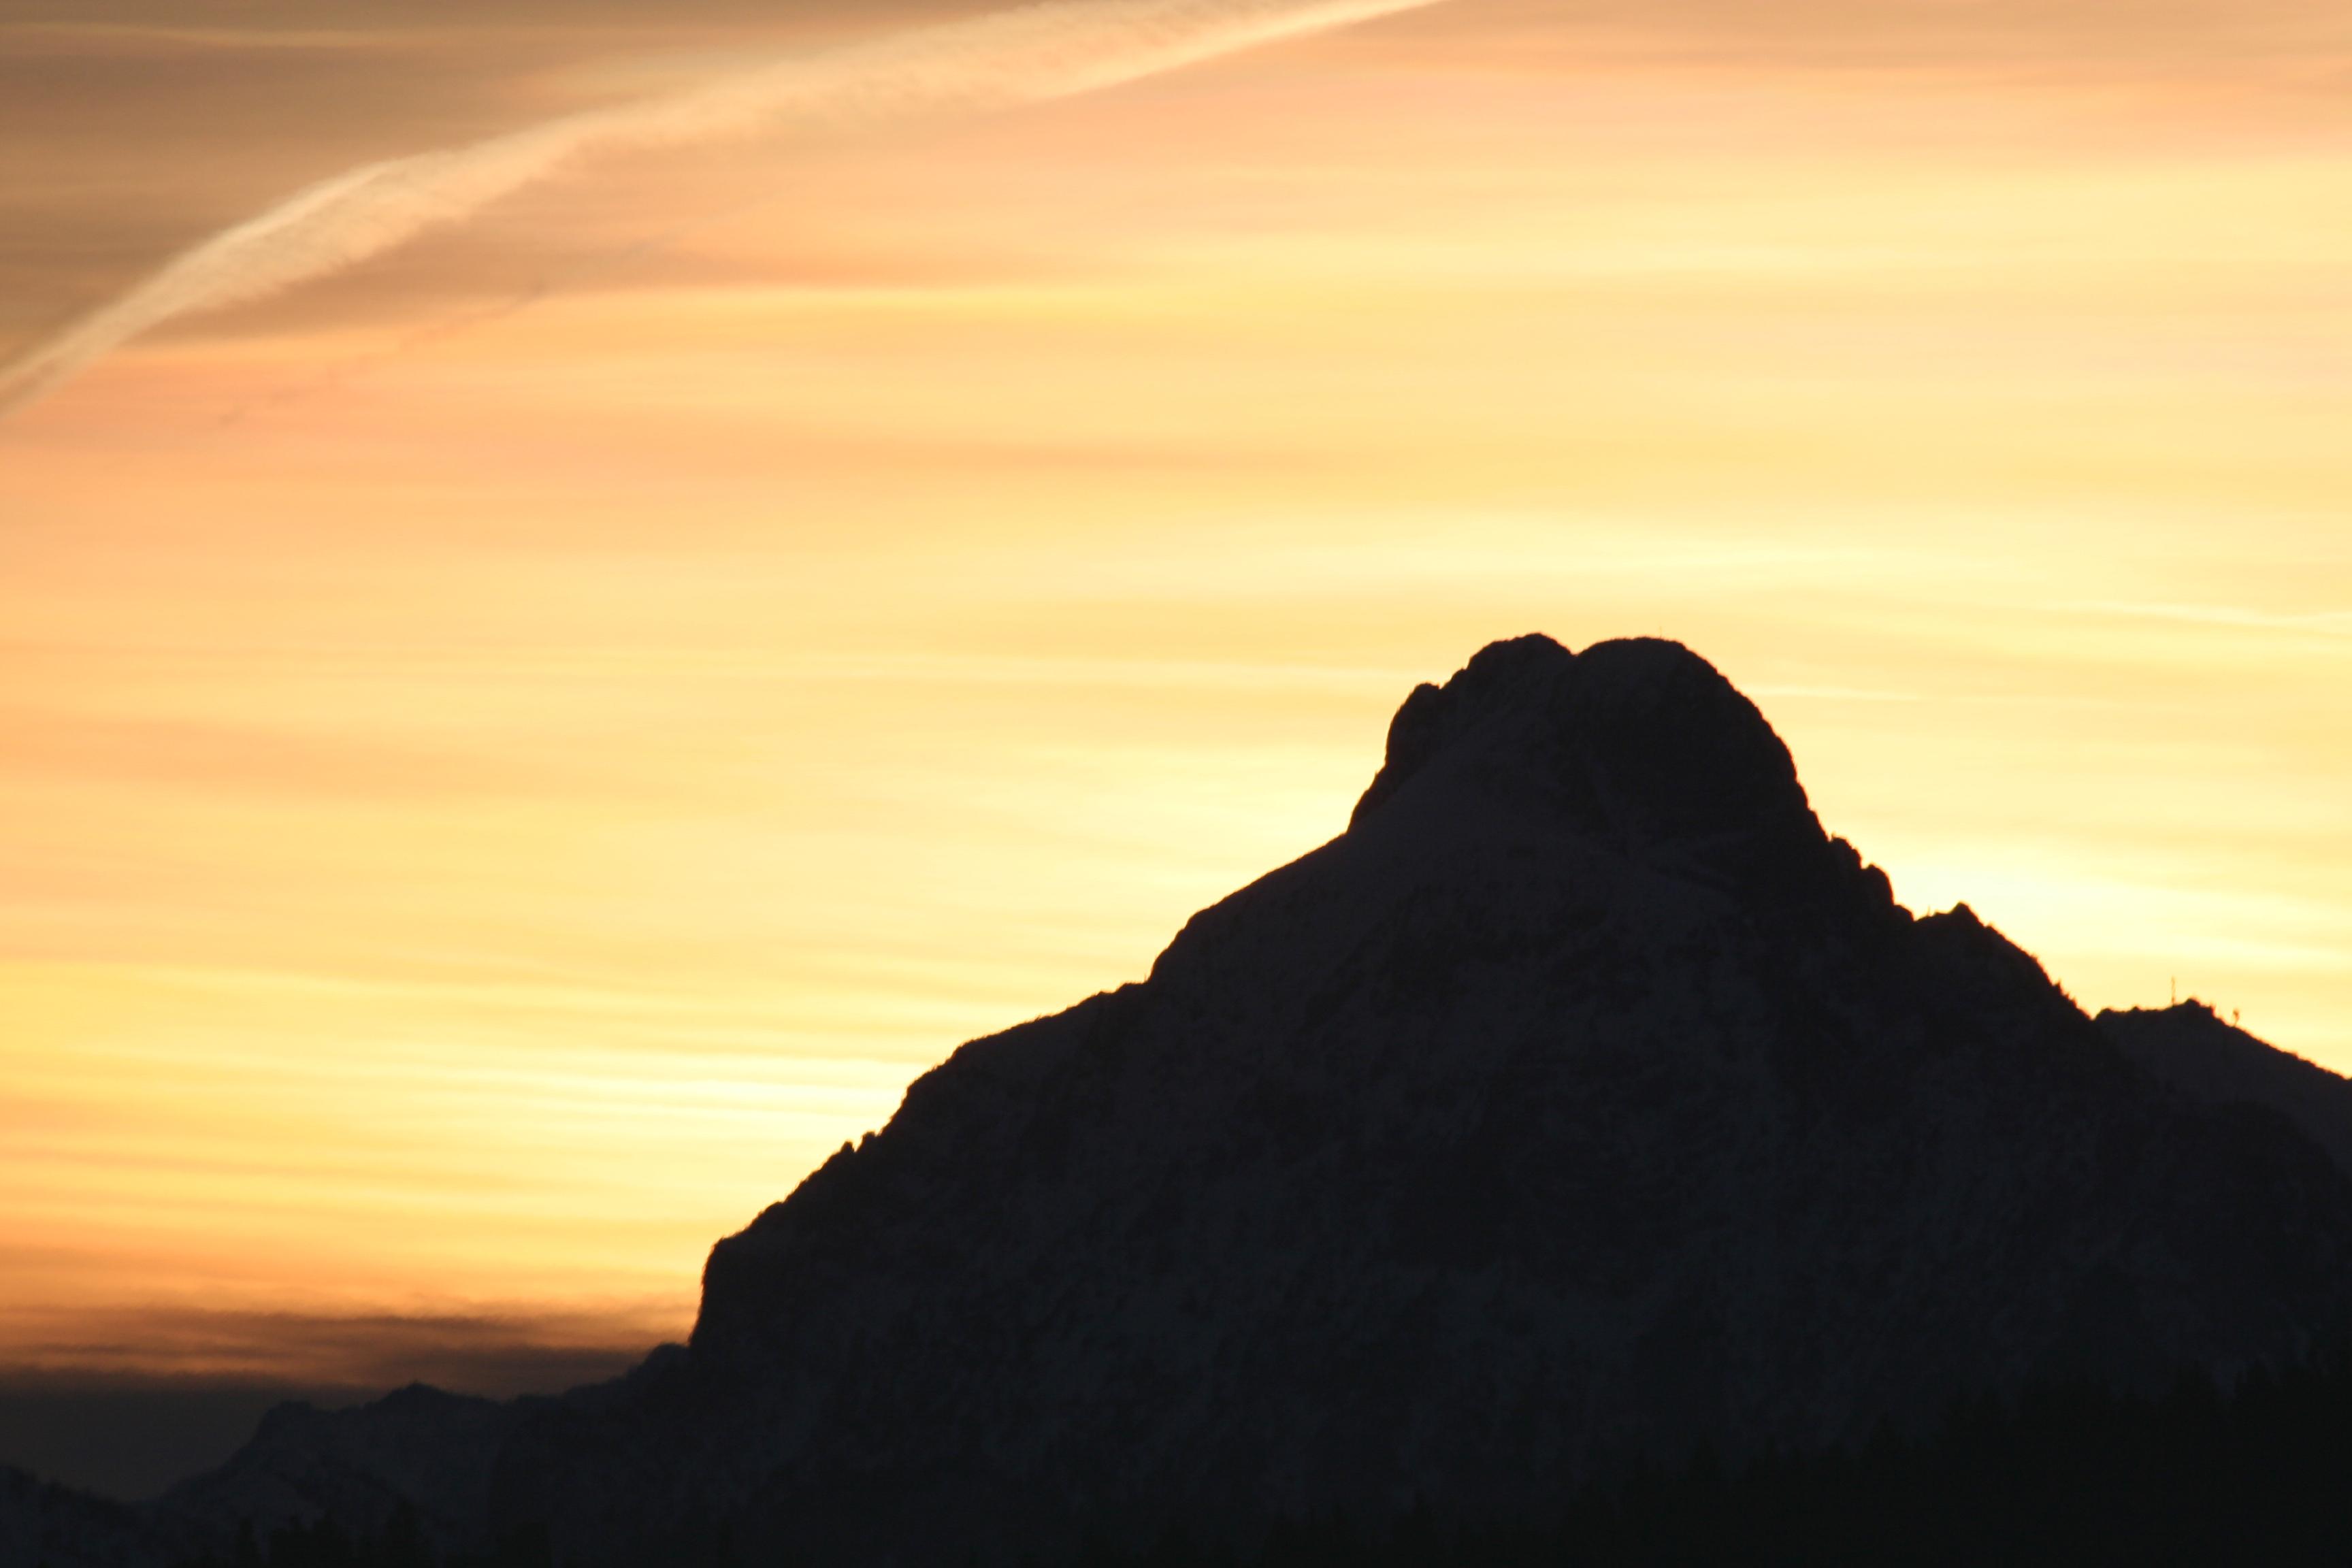 Hof Alpenseeblick Sonnenuntergang im Herbst